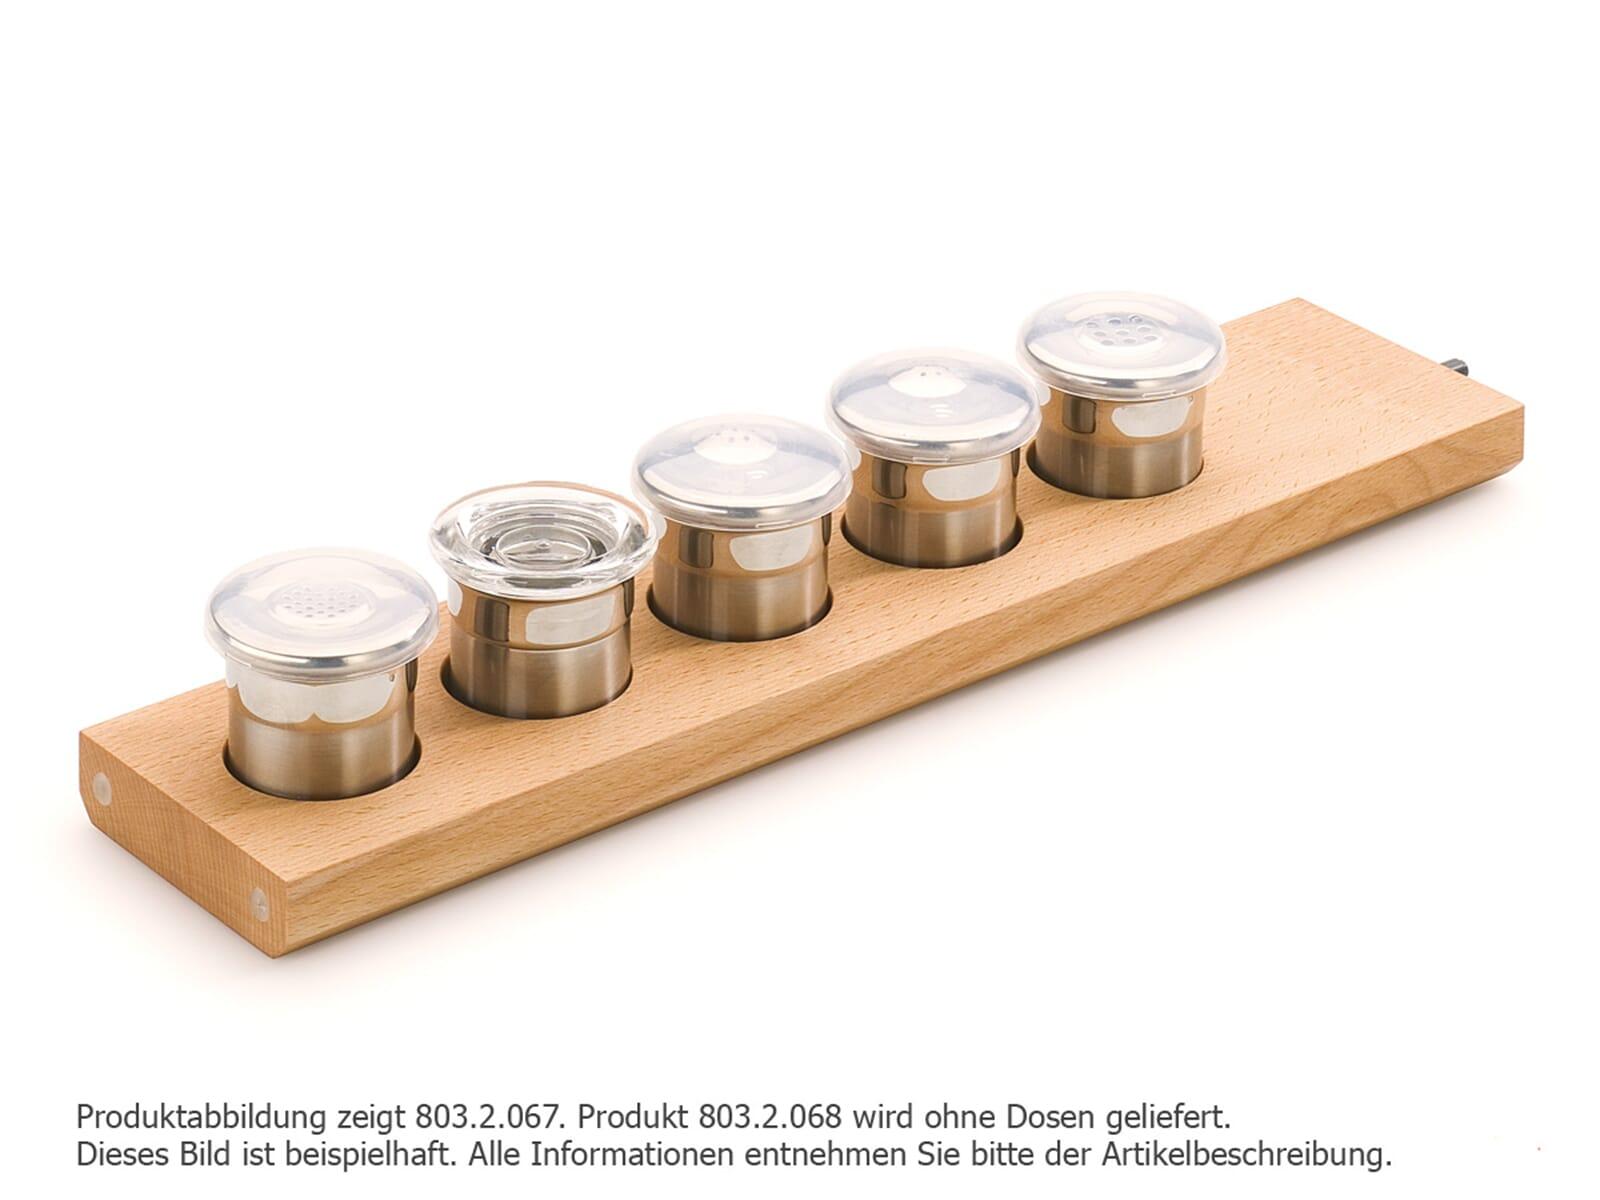 Produktabbildung Naber 803.2.068